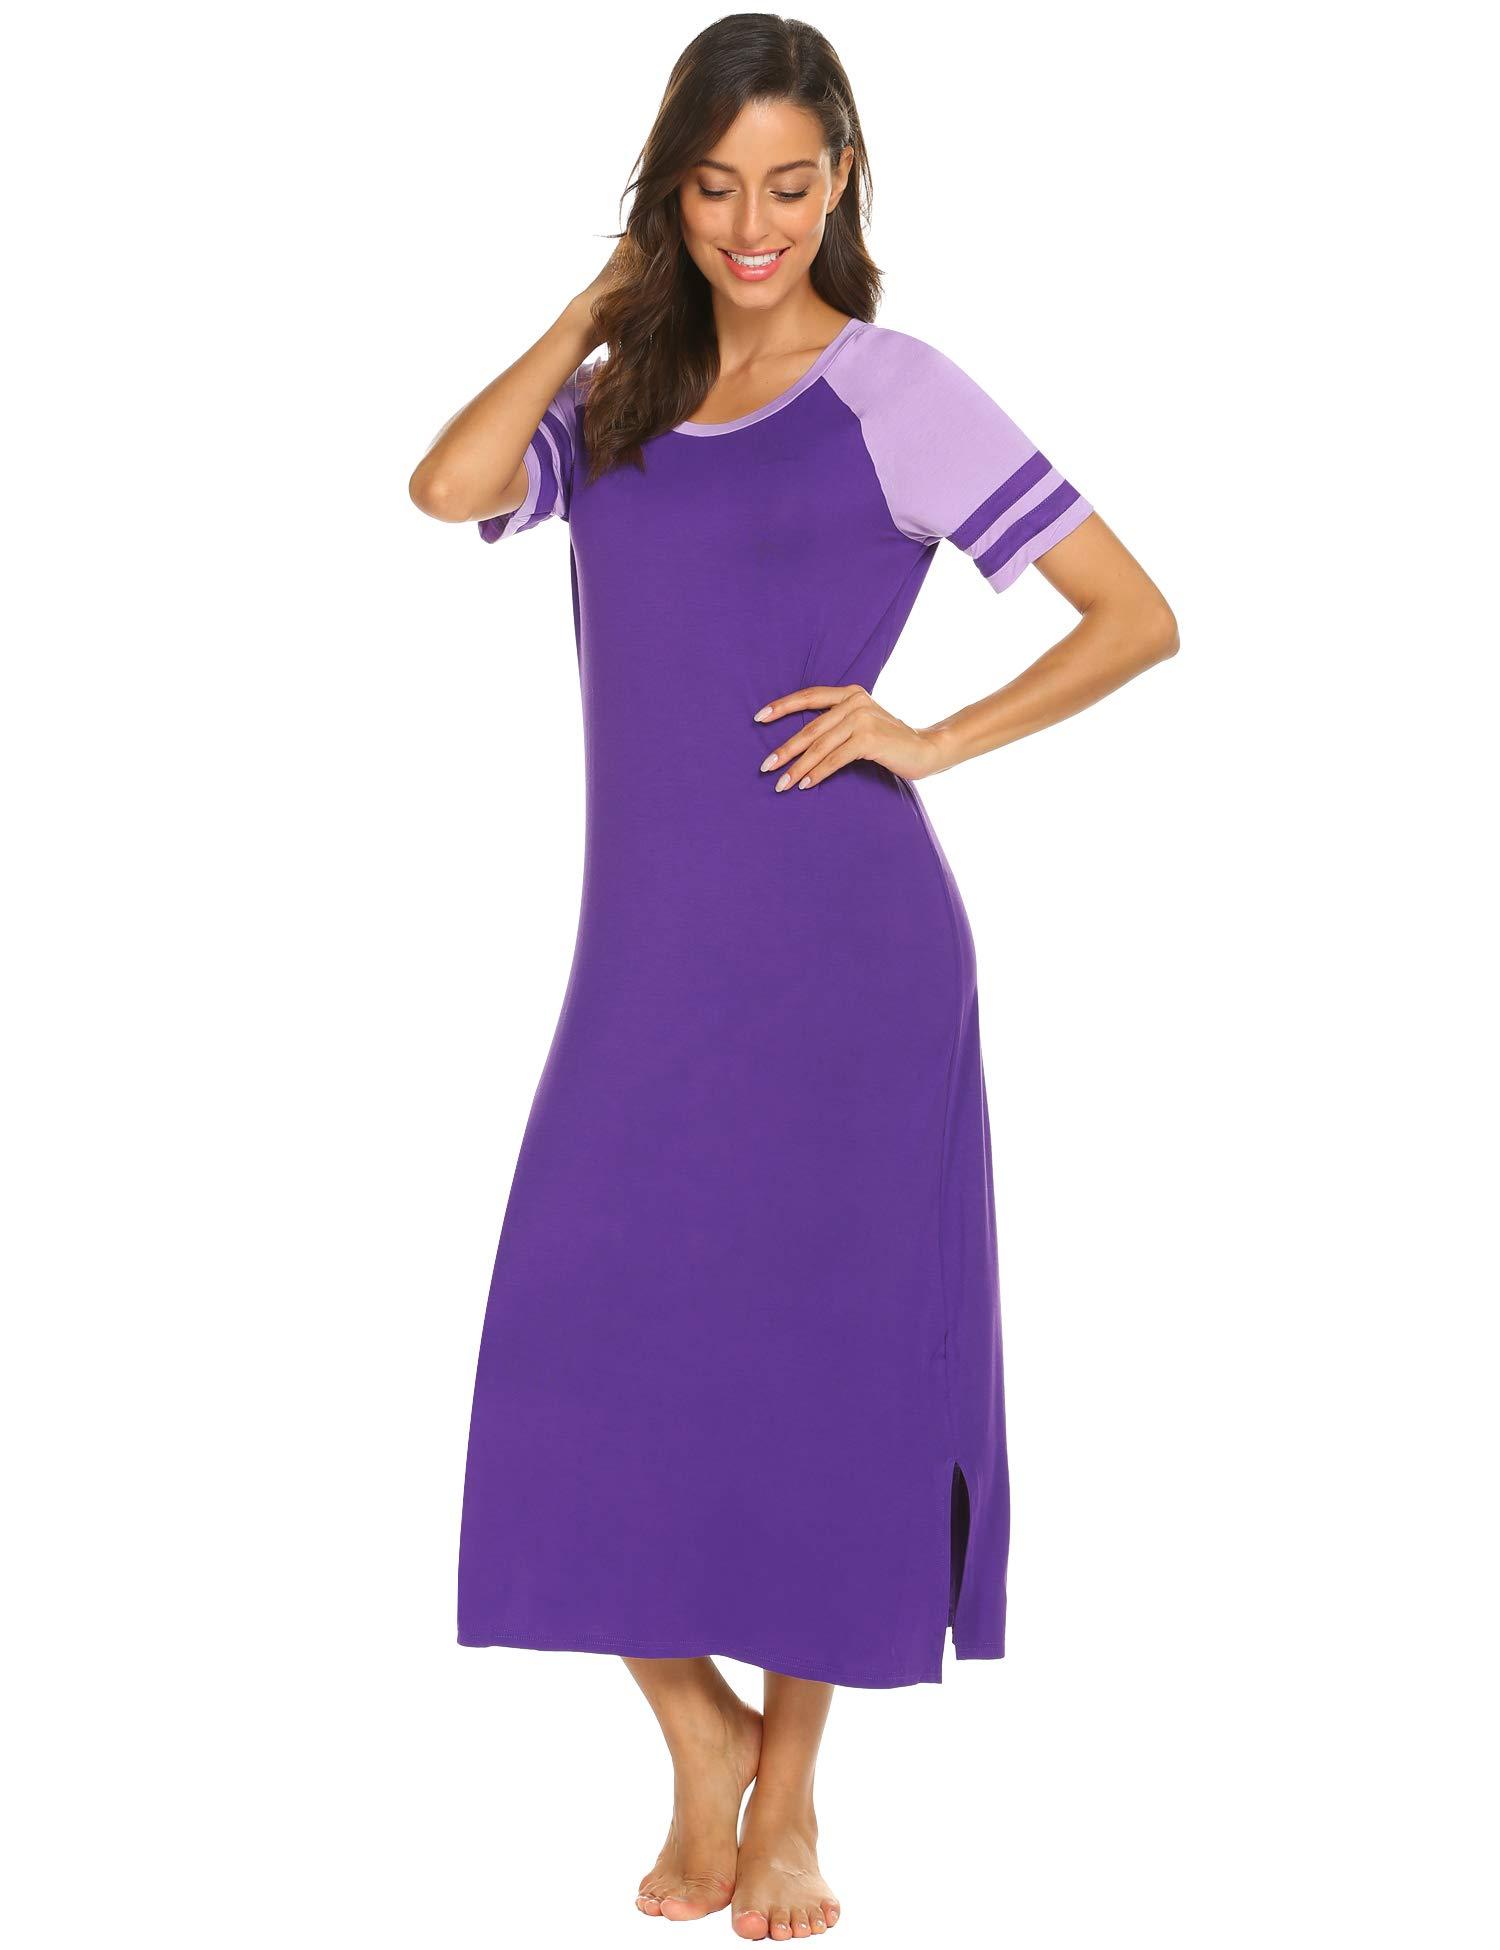 Loungewear Long Nightgown Maxi Nightshirt Full Length Sleep Shirt Lounge Dress Sleepwear purple XXL